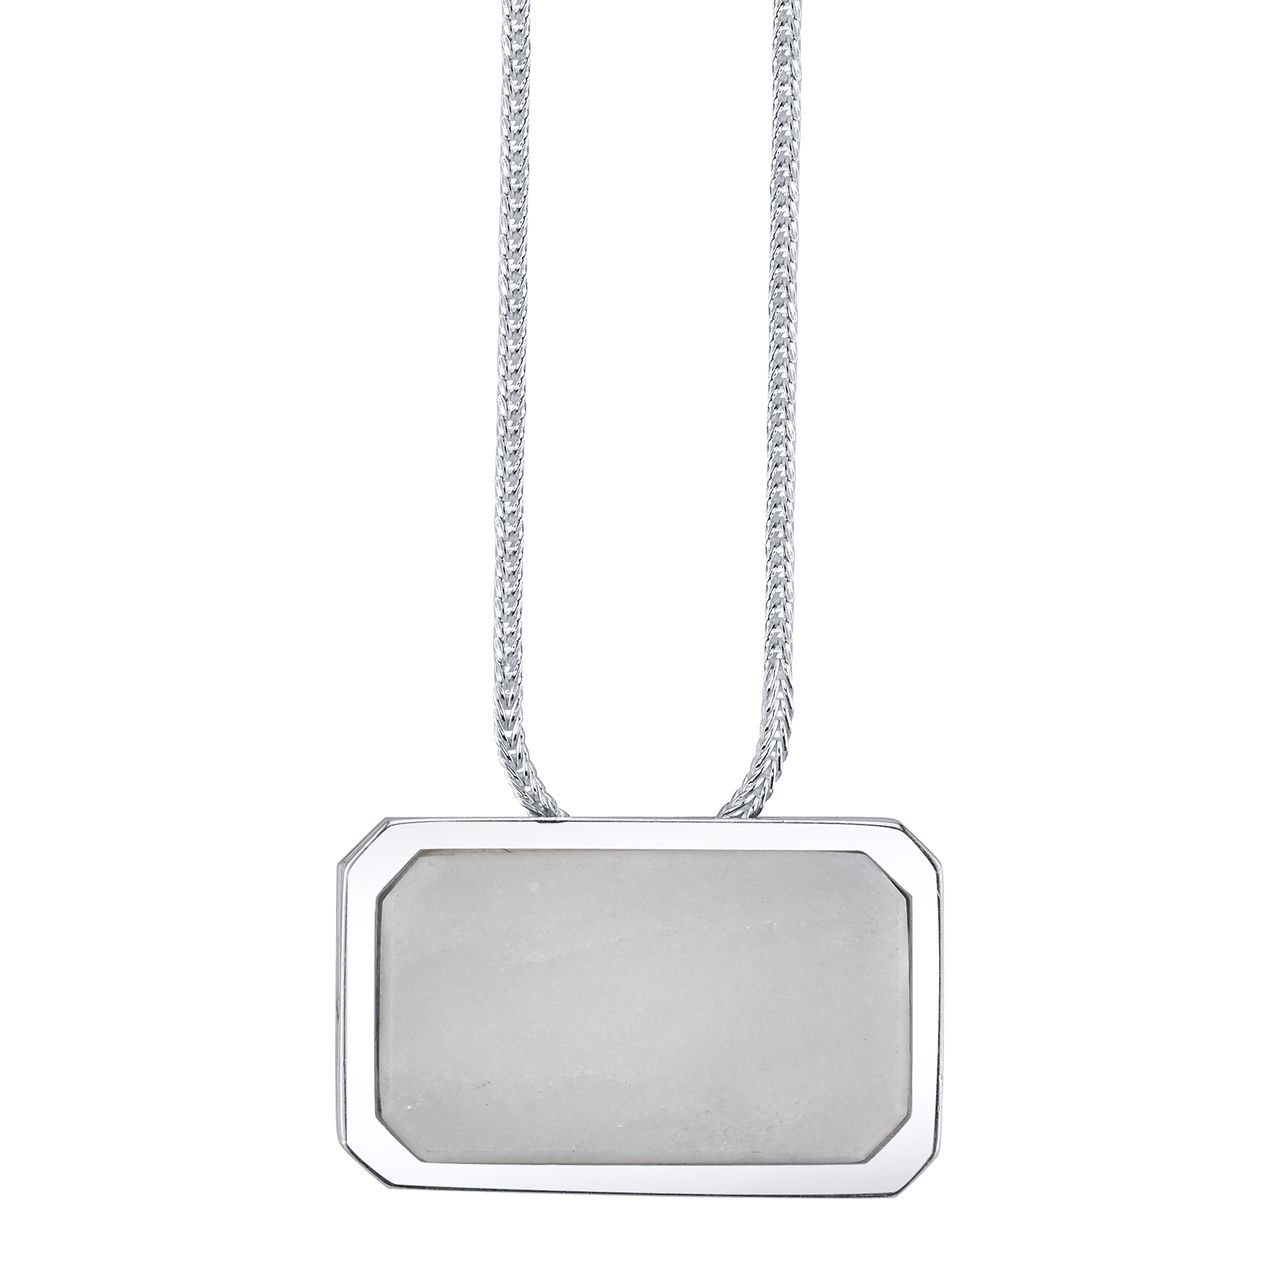 Gabriela Artigas Online Store - White Carrara Marbel Plate Pendnat on Sterling Silver Chain, $350.00 (http://www.gabrielaartigas.com/white-carrara-marbel-plate-pendnat-on-sterling-silver-chain/)